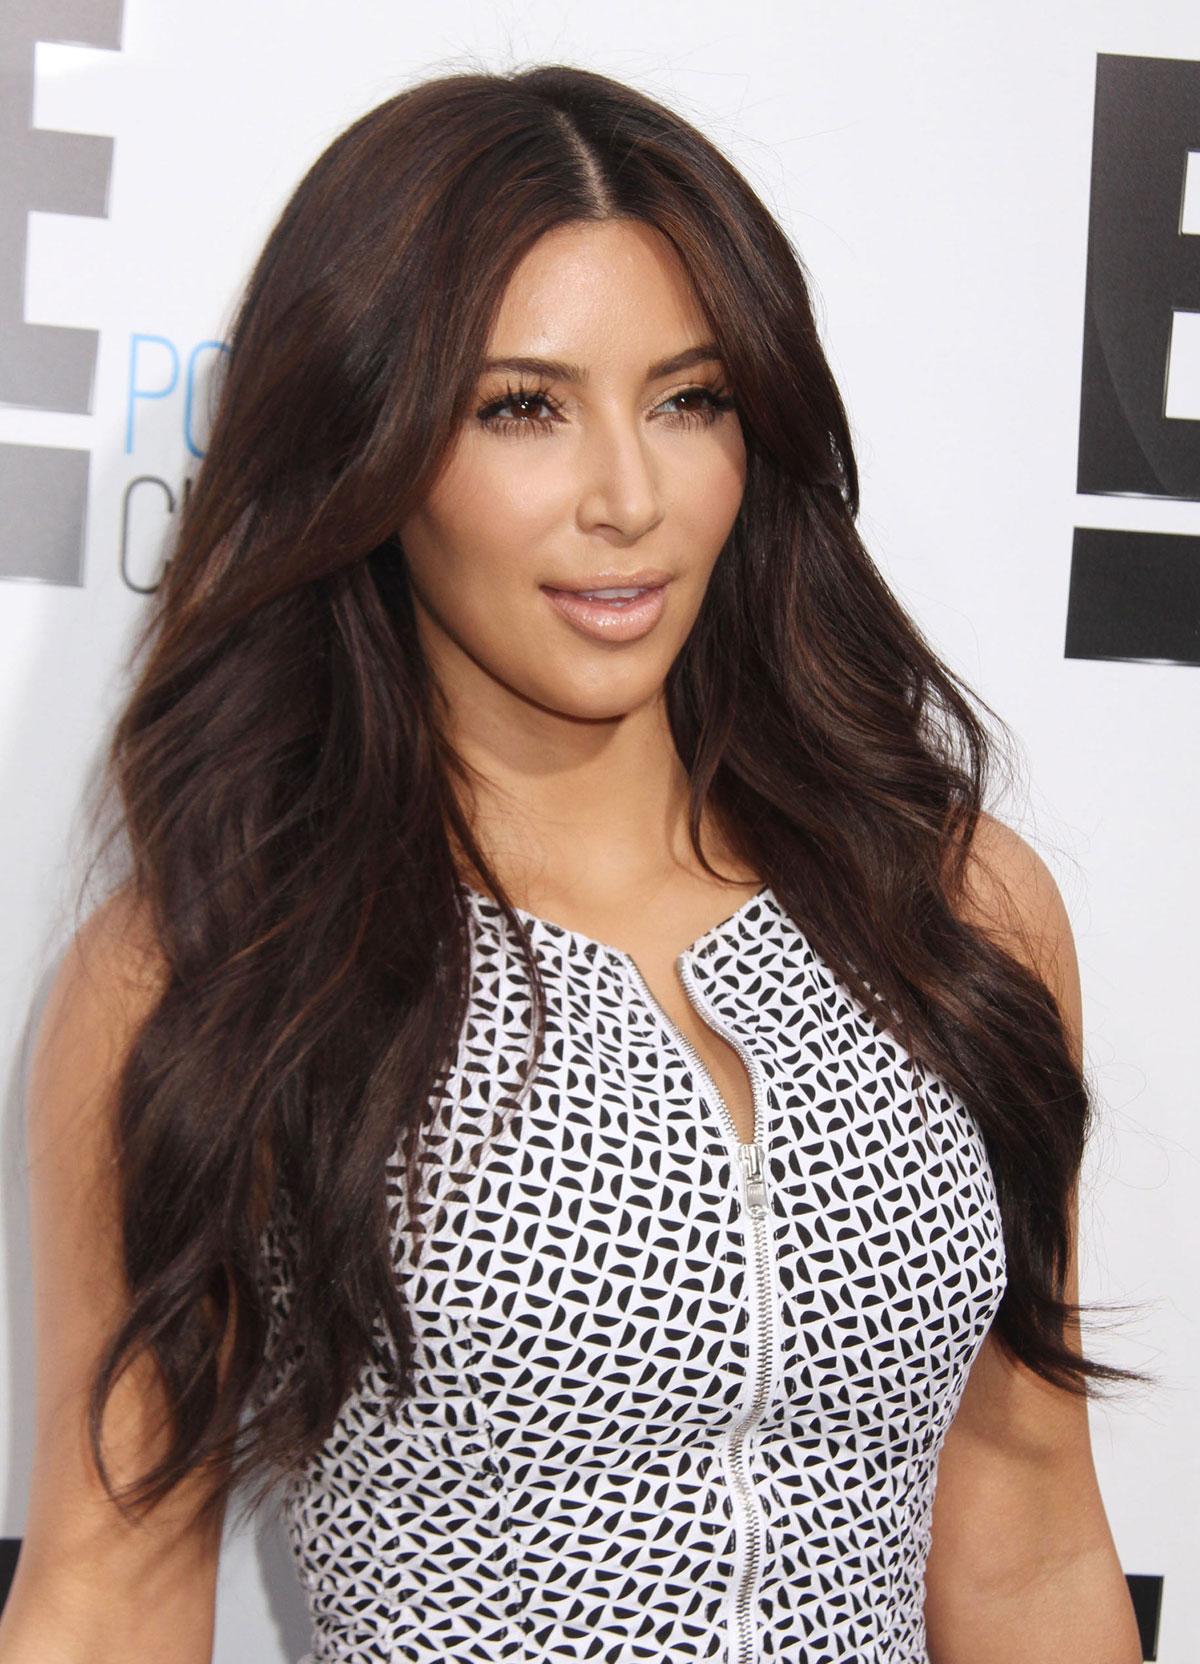 Kim Kardashian introduces her new fragrance - KK in New